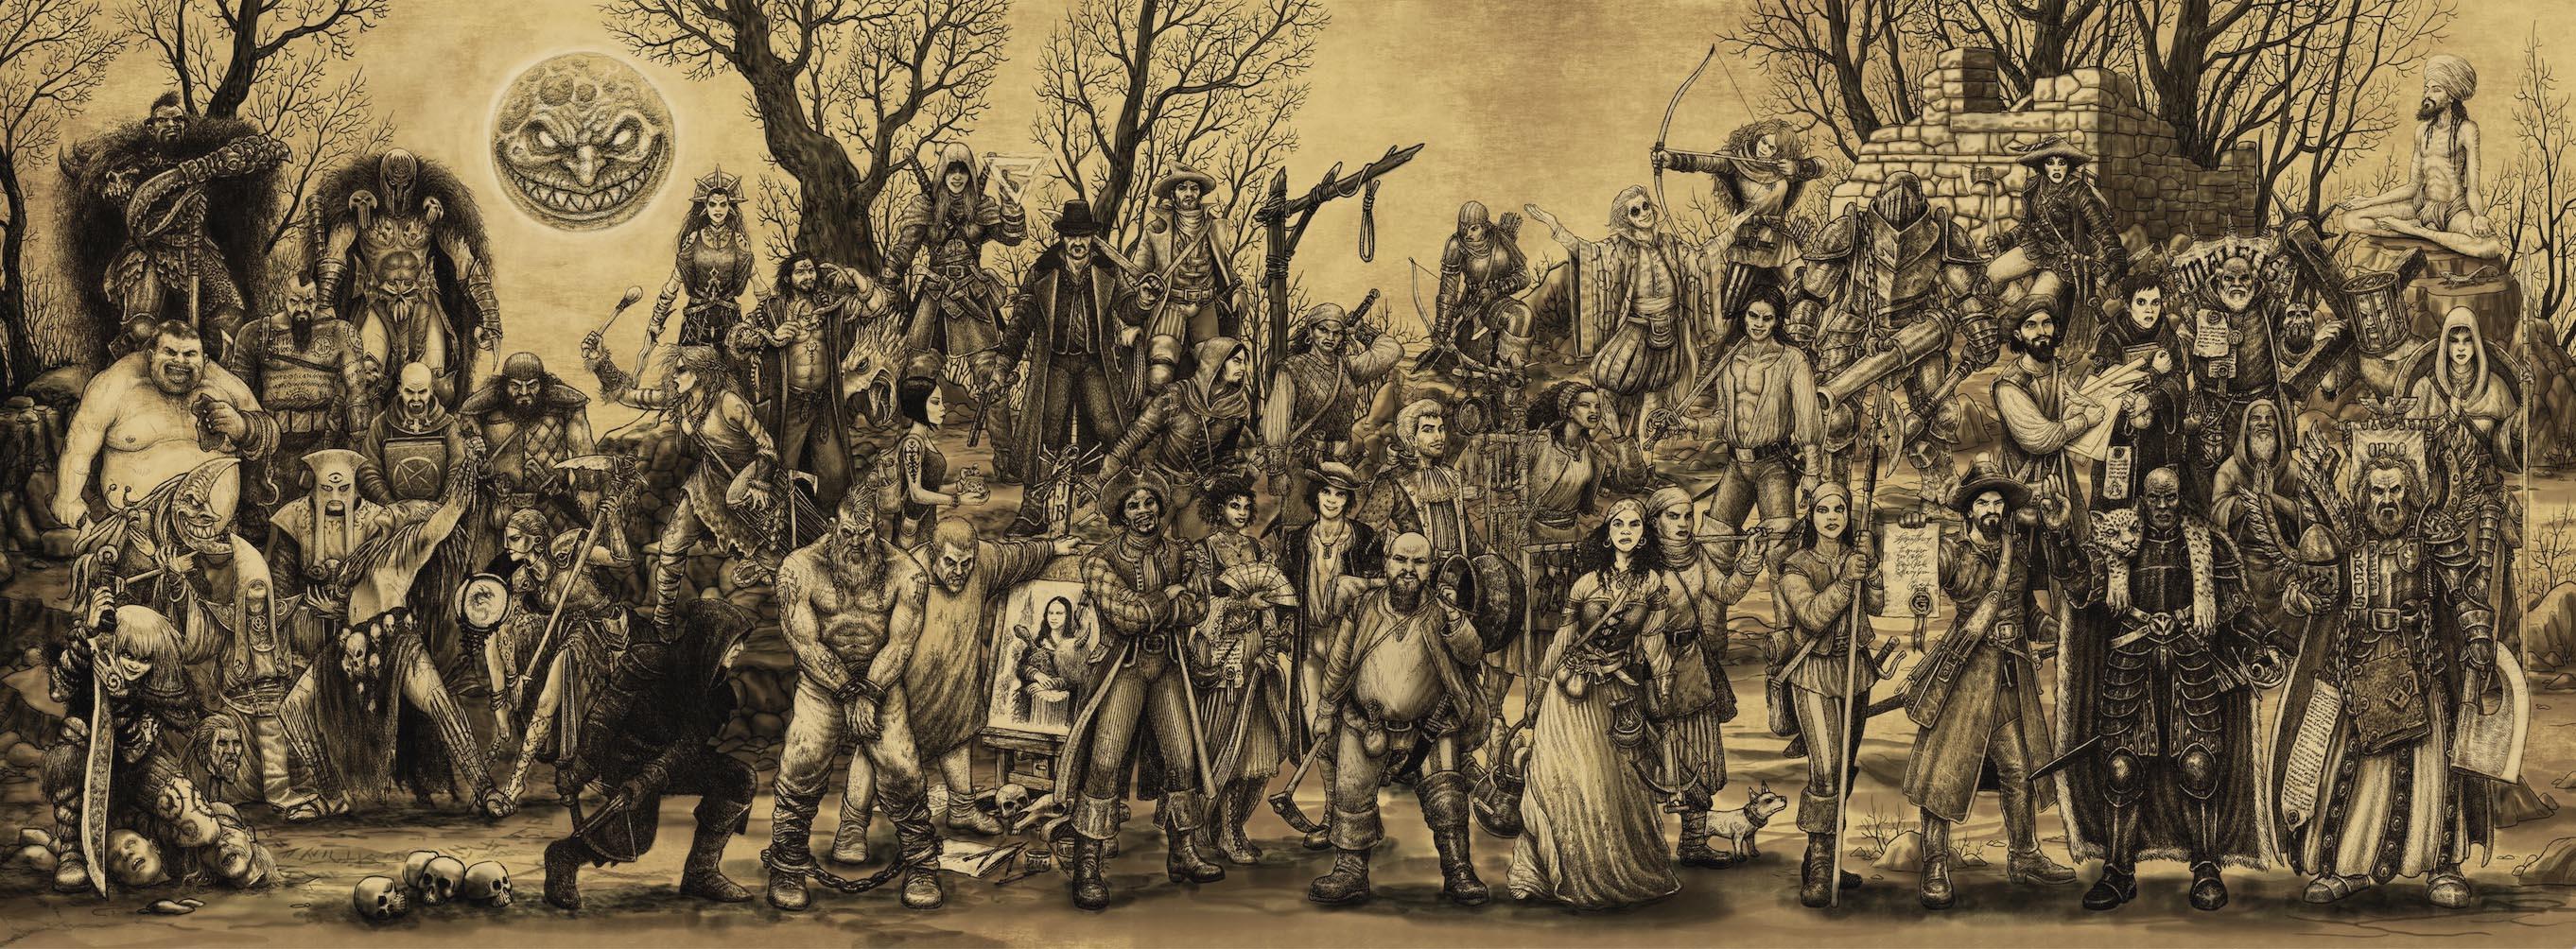 Roll20 Spotlight Encounter Roleplay Blackhearts Zweihander RPG Powered by Zweihander #TetsuboRPG Tetsubo RPG tetsubo.com main gauche RPG MainGauche grim and perilous srd.grimandperilous.com zweihander rpg #ZweihanderRPG #MainGauche #GrimAndPerilous #GrimAndPerilousLibrary #DarkFantasy grimandperilous.com warhammer fantasy roleplay retroclone warhammerfantasyroleplay.com #WFRP #DND